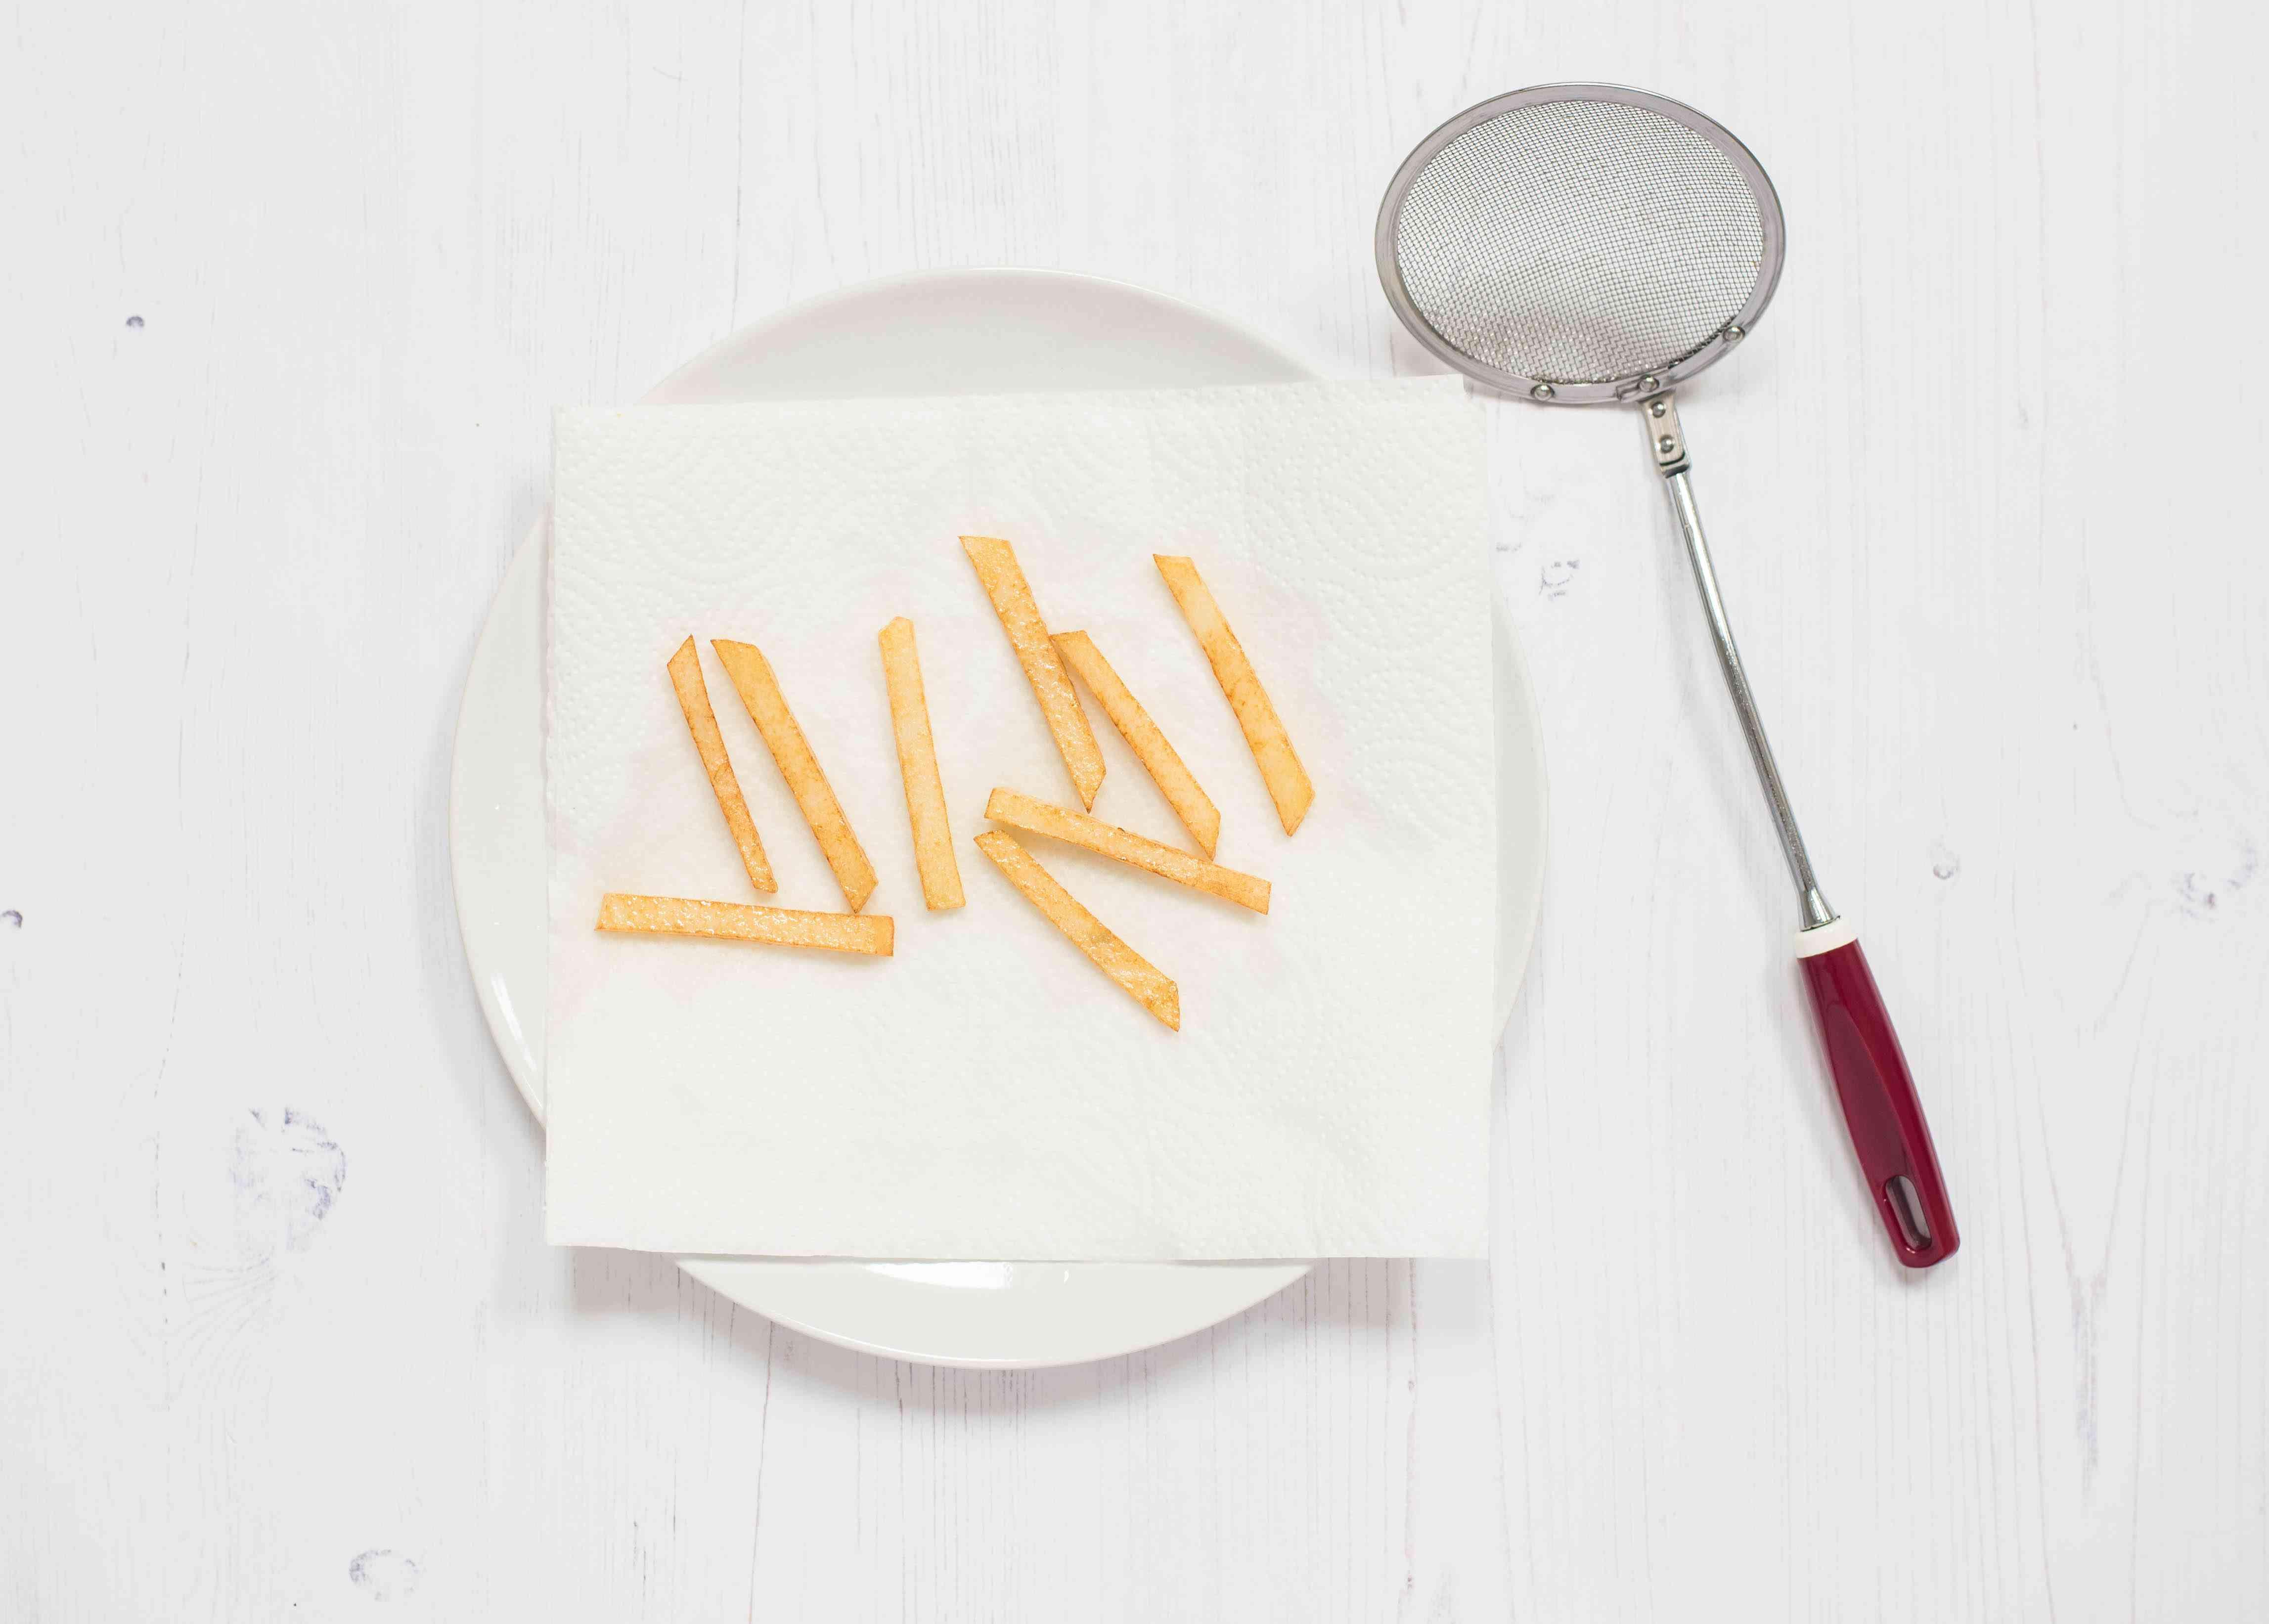 Turn fries